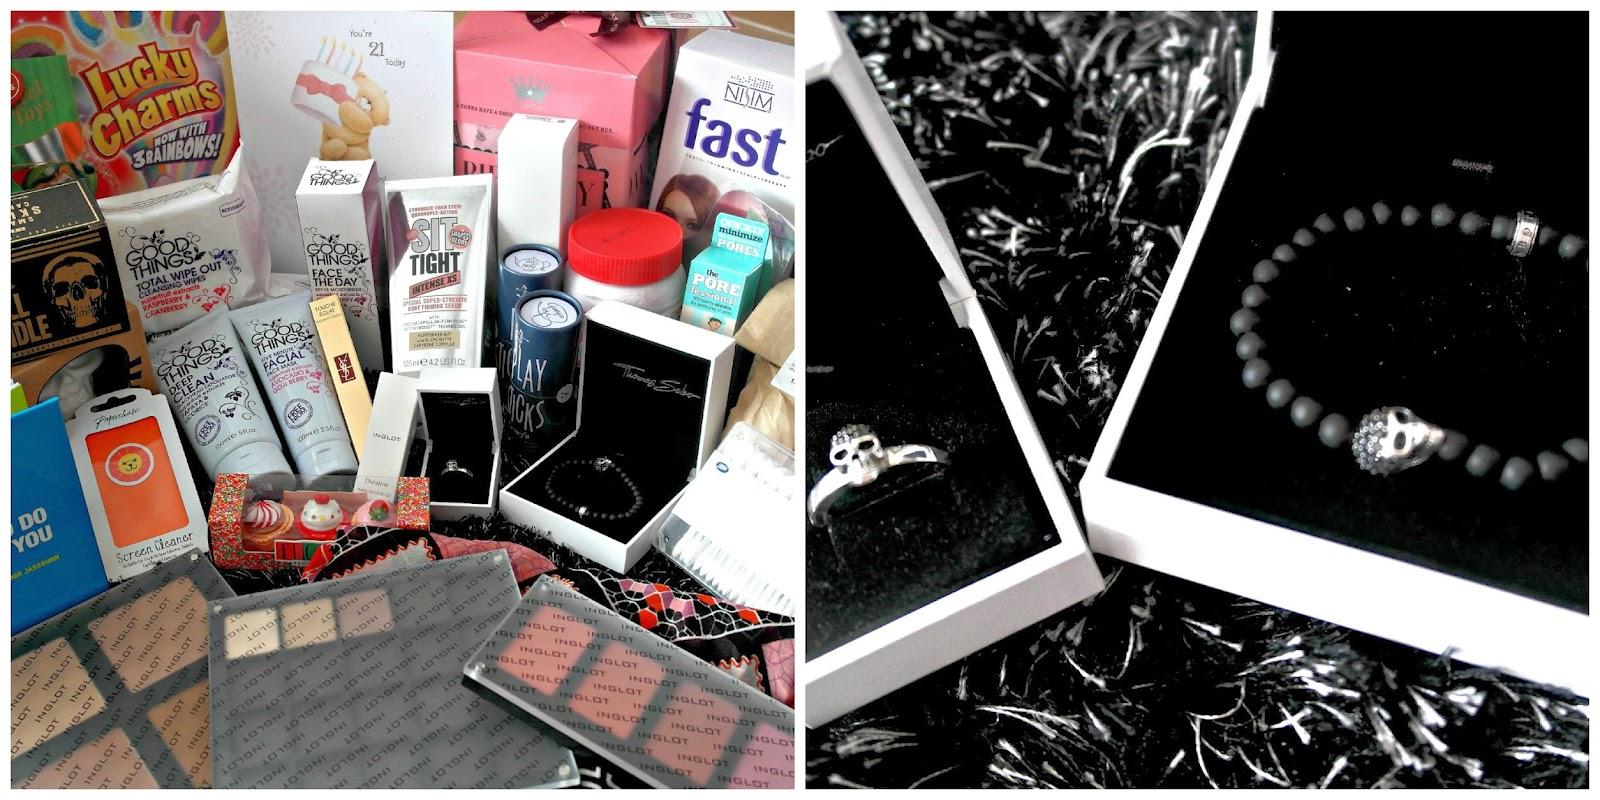 Spoiled boyfriend gifts